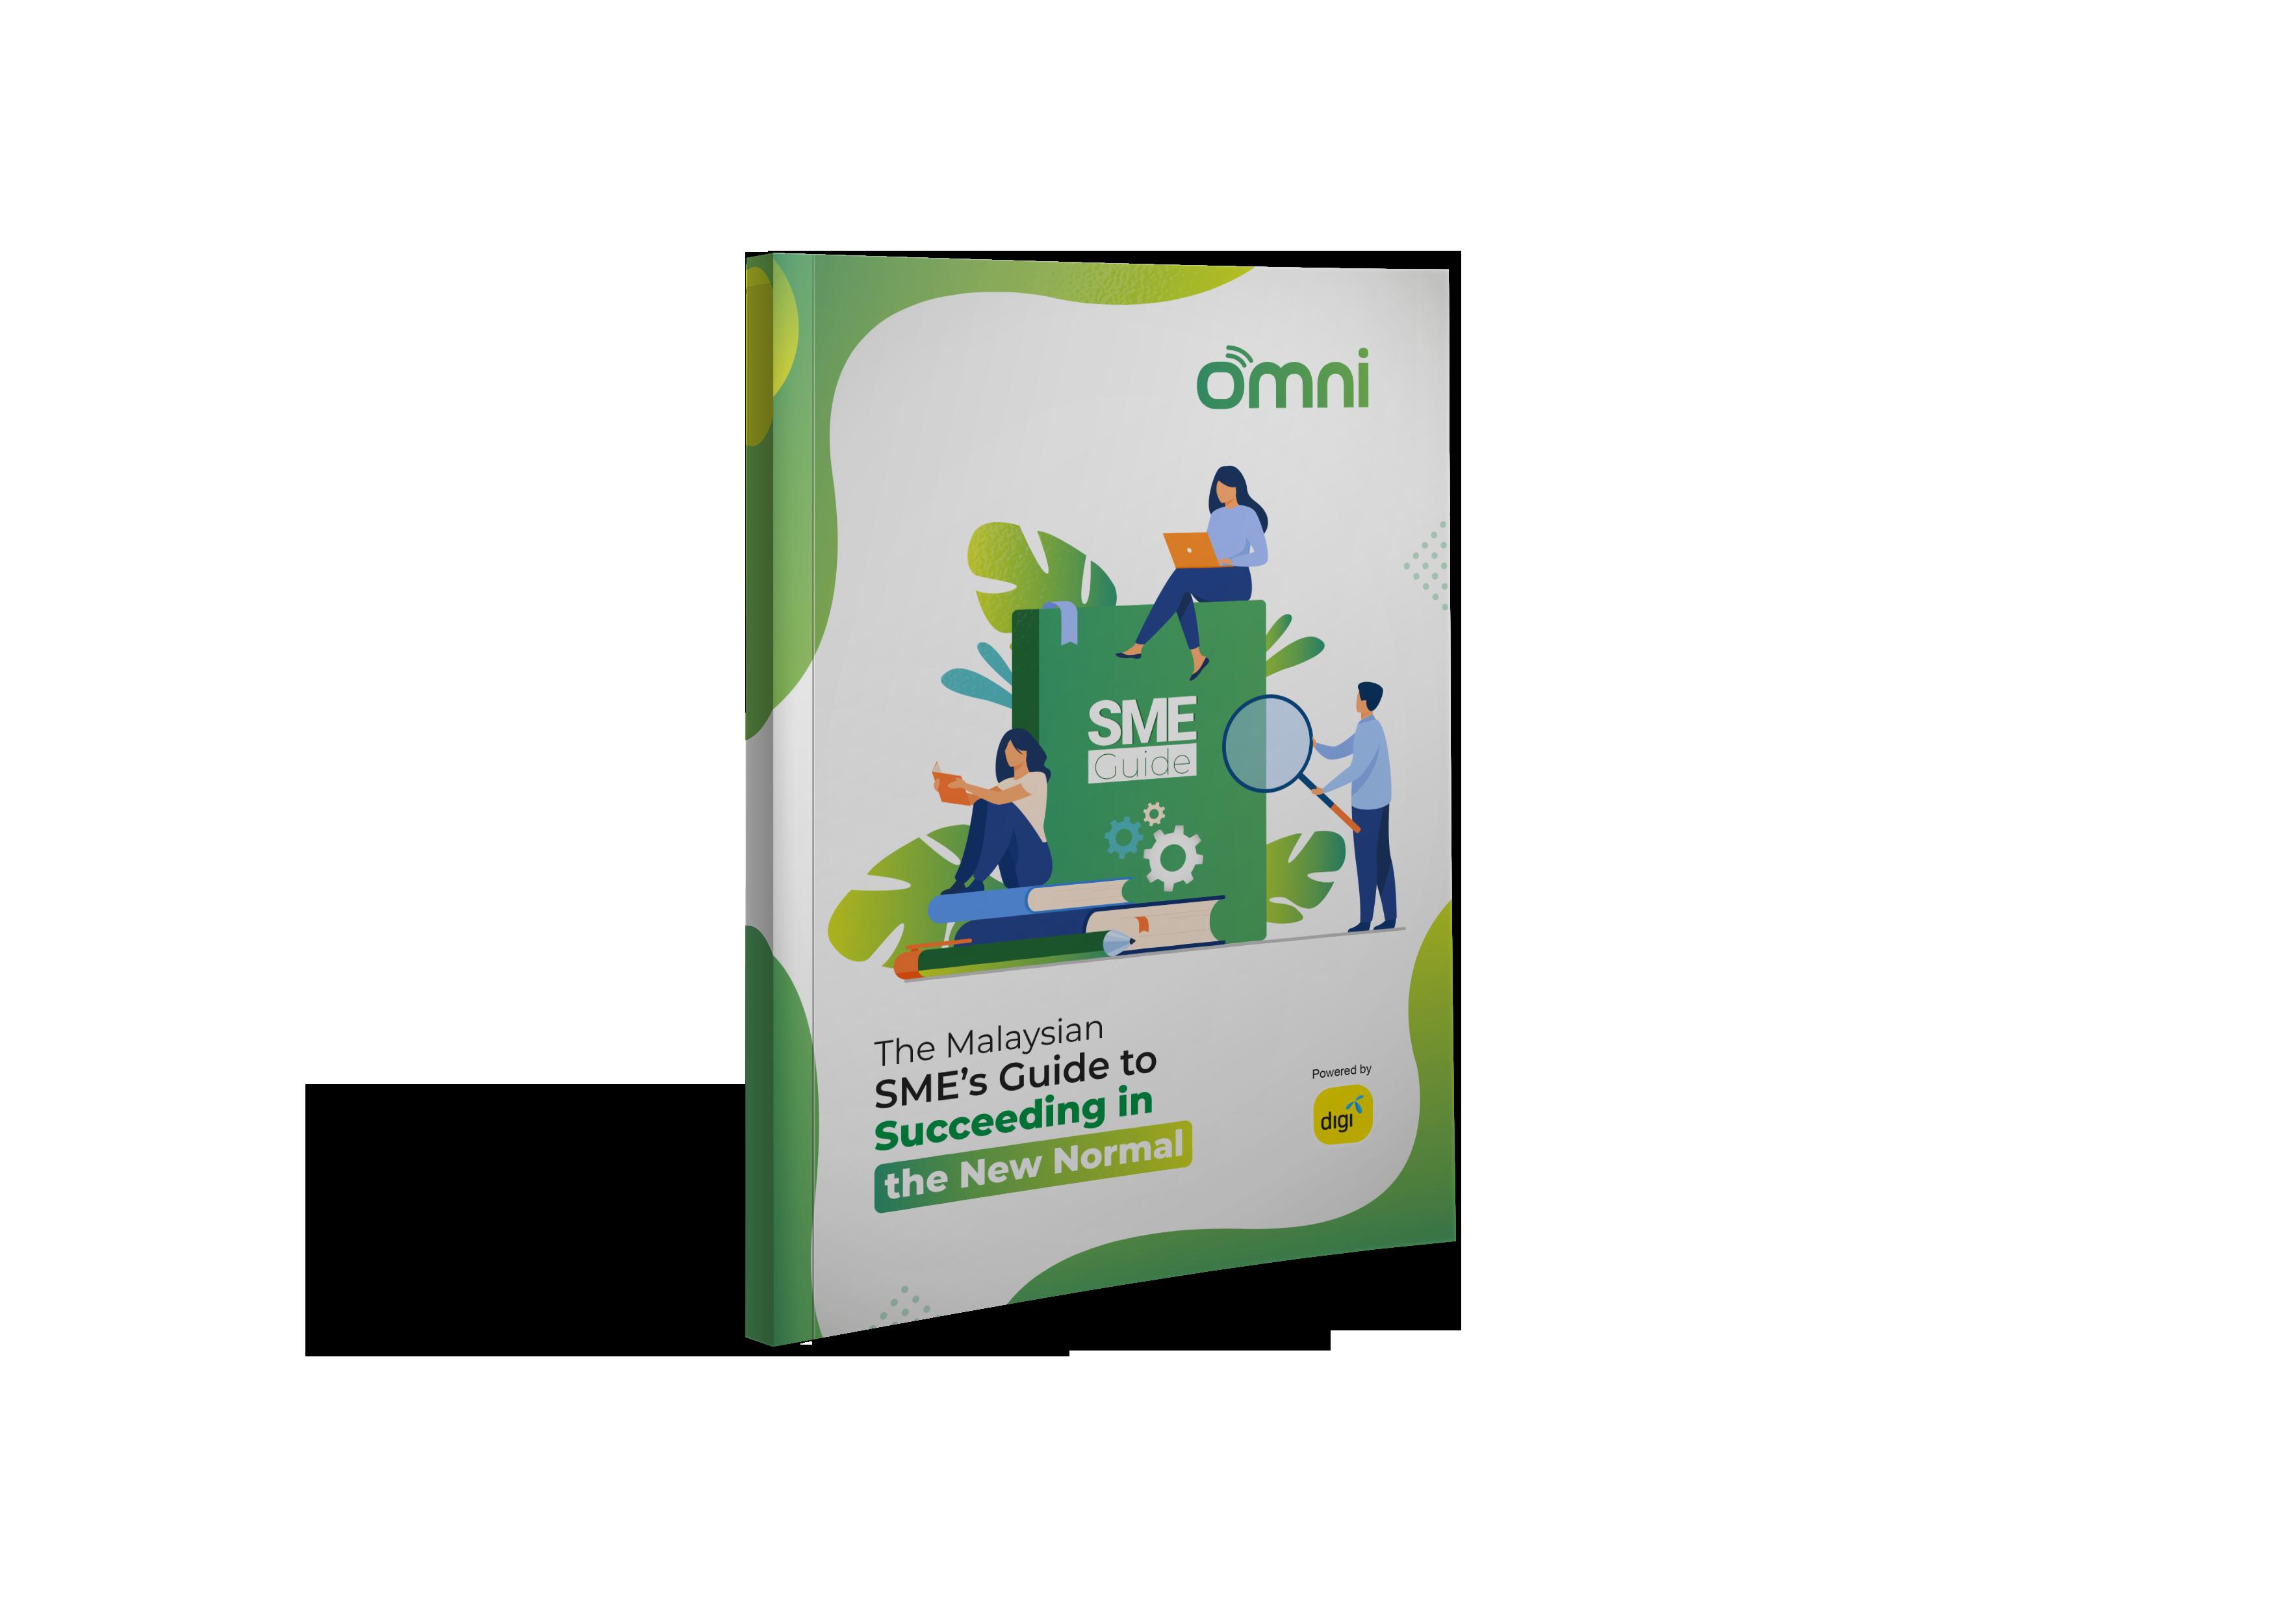 sales call guide ebook